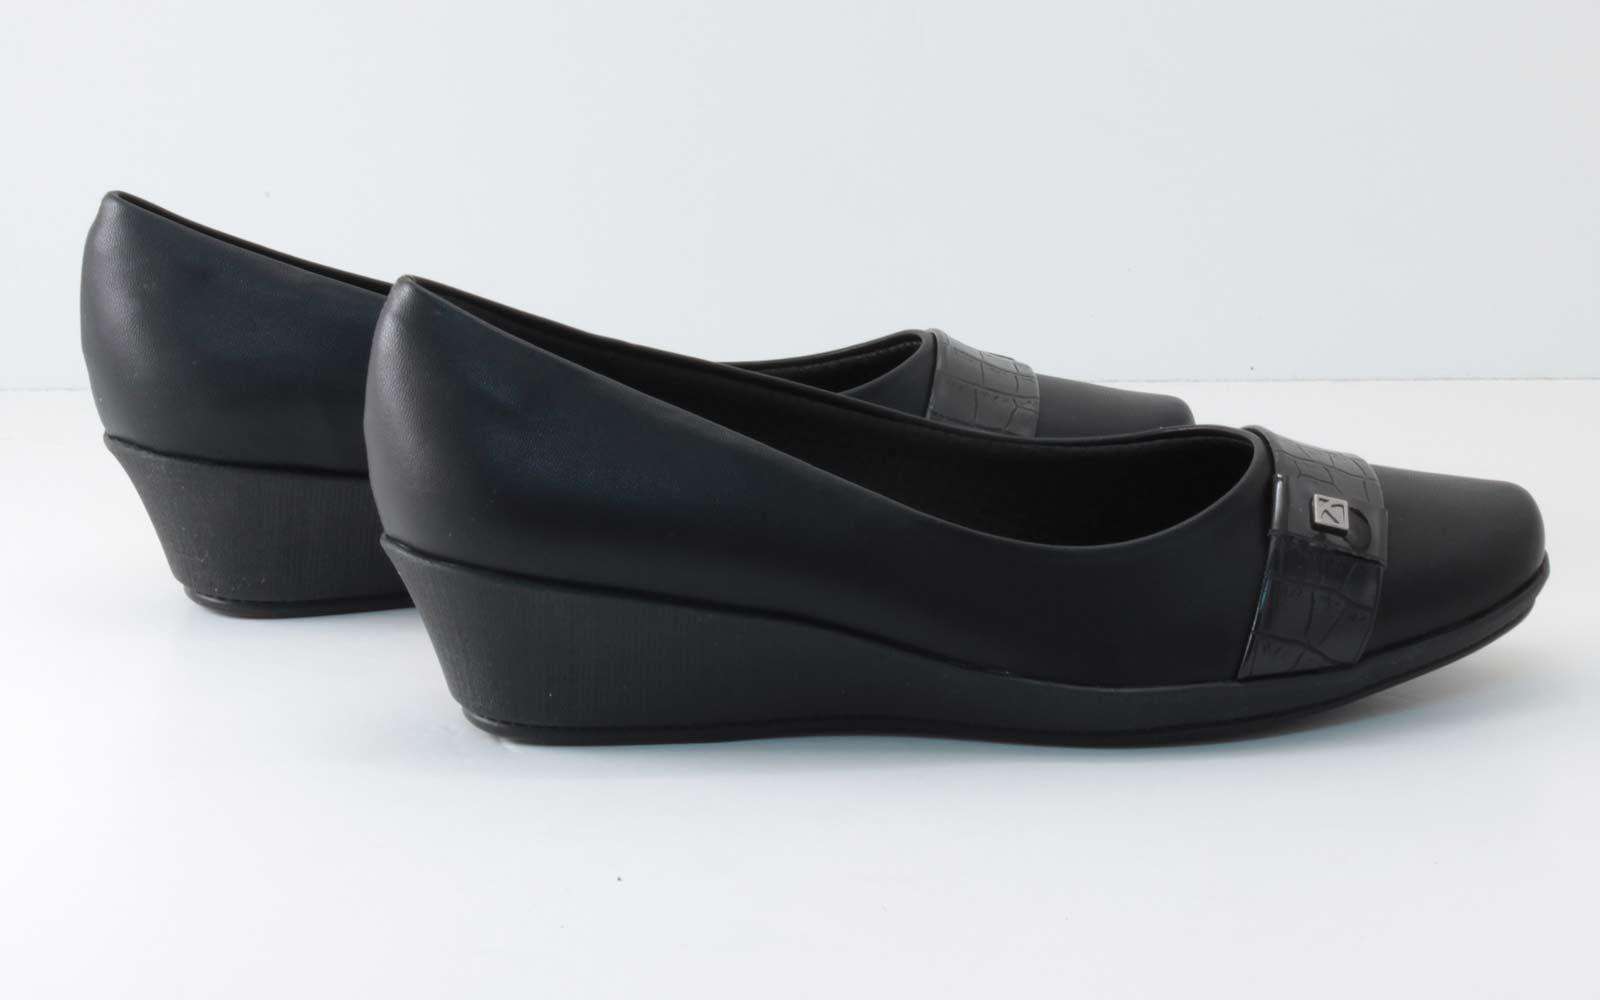 Sapato Piccadilly Feminina Anabela 144021  - Ian Calçados